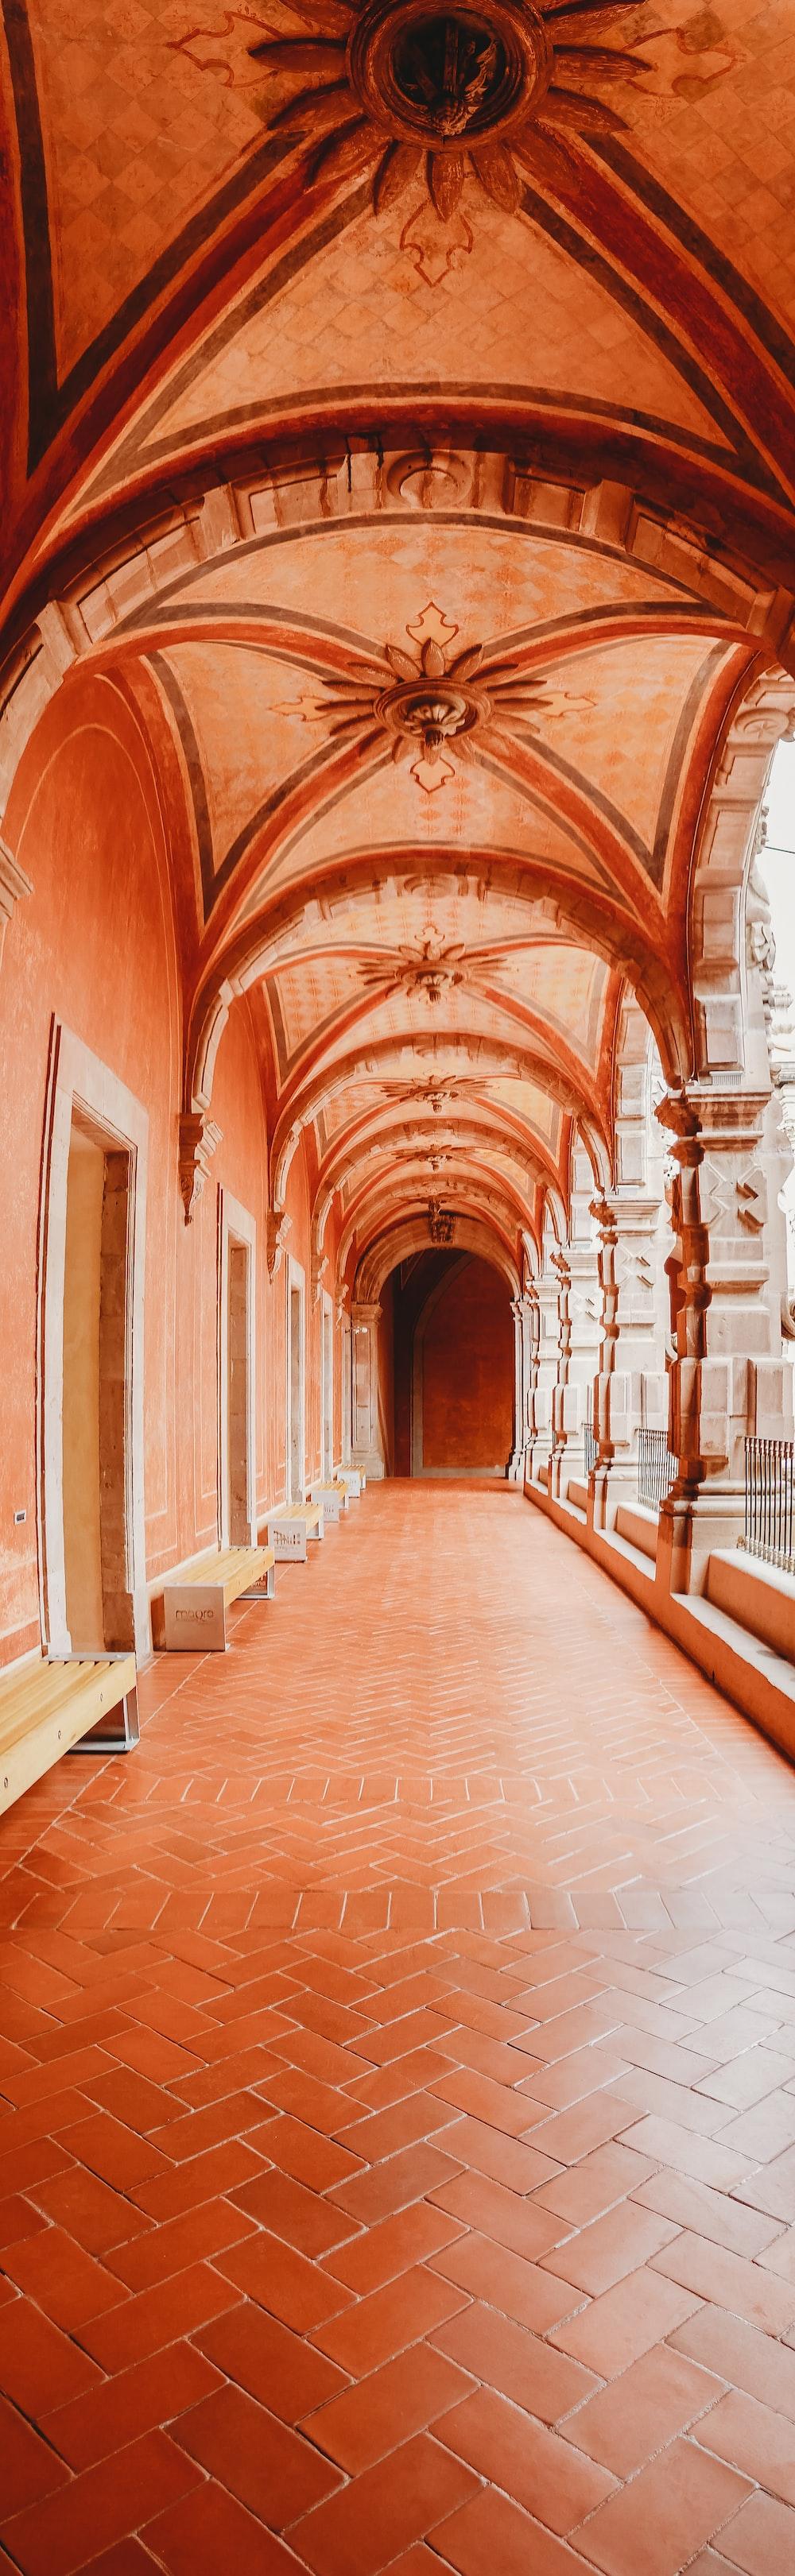 empty brown hallway